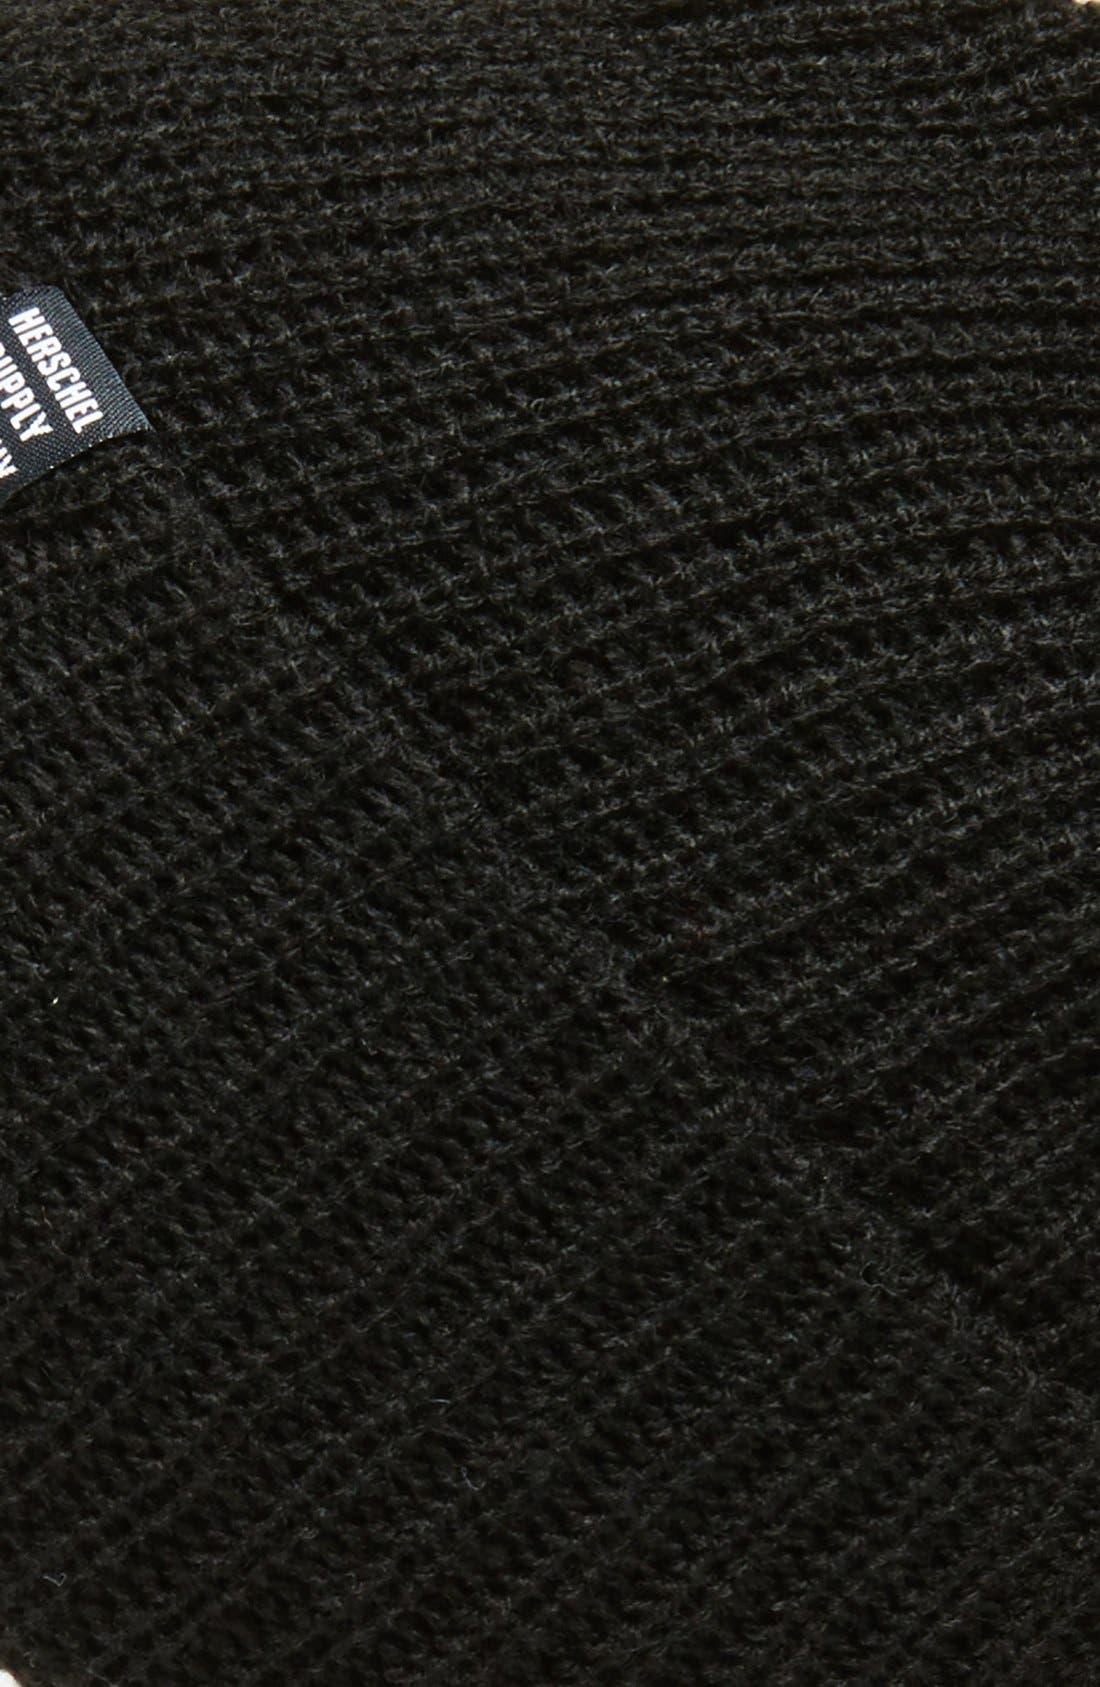 'Quartz' Solid Knit Cap,                             Alternate thumbnail 10, color,